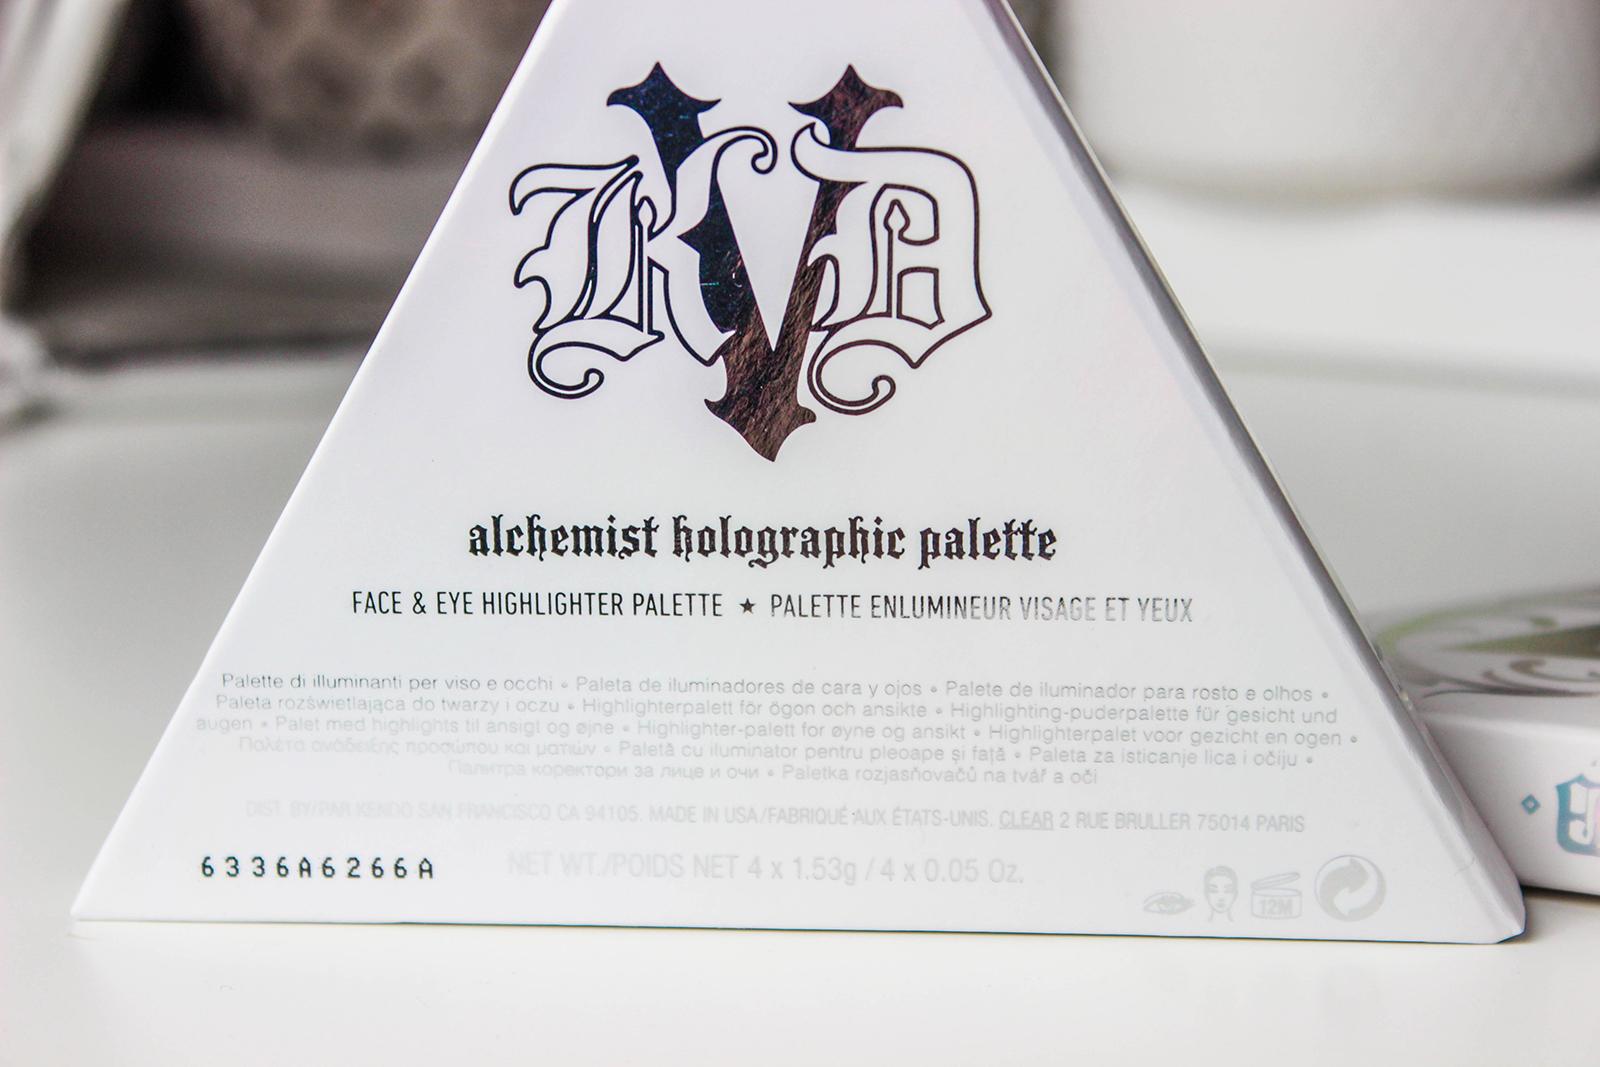 KatVonD-Alchemist-Holographic-Palette-7